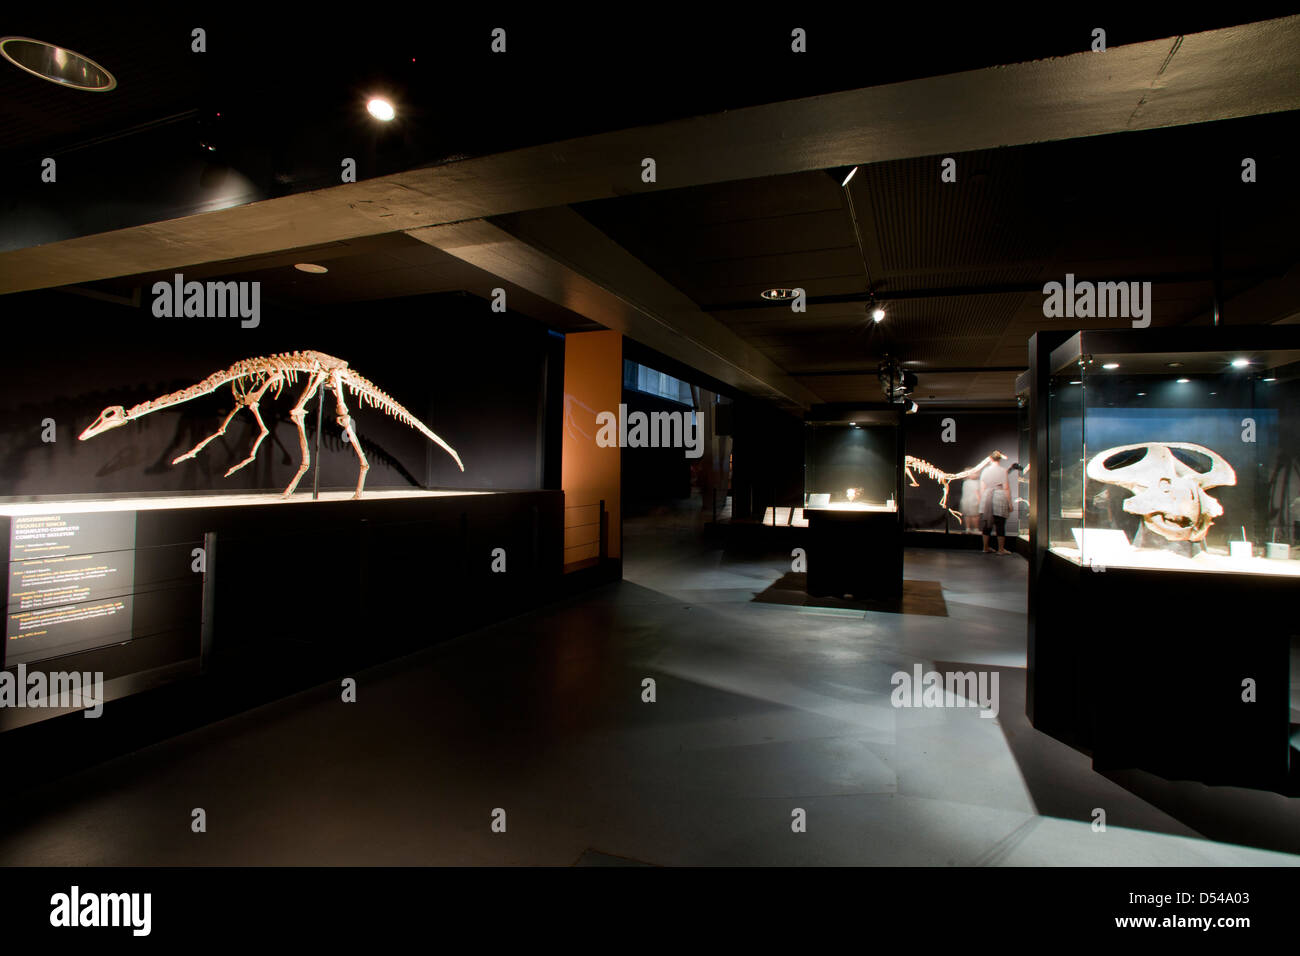 Exposition of Dinosaurs from Gobi desert in Mongolia. Cosmocaixa museum, Barcelona, Spain Stock Photo